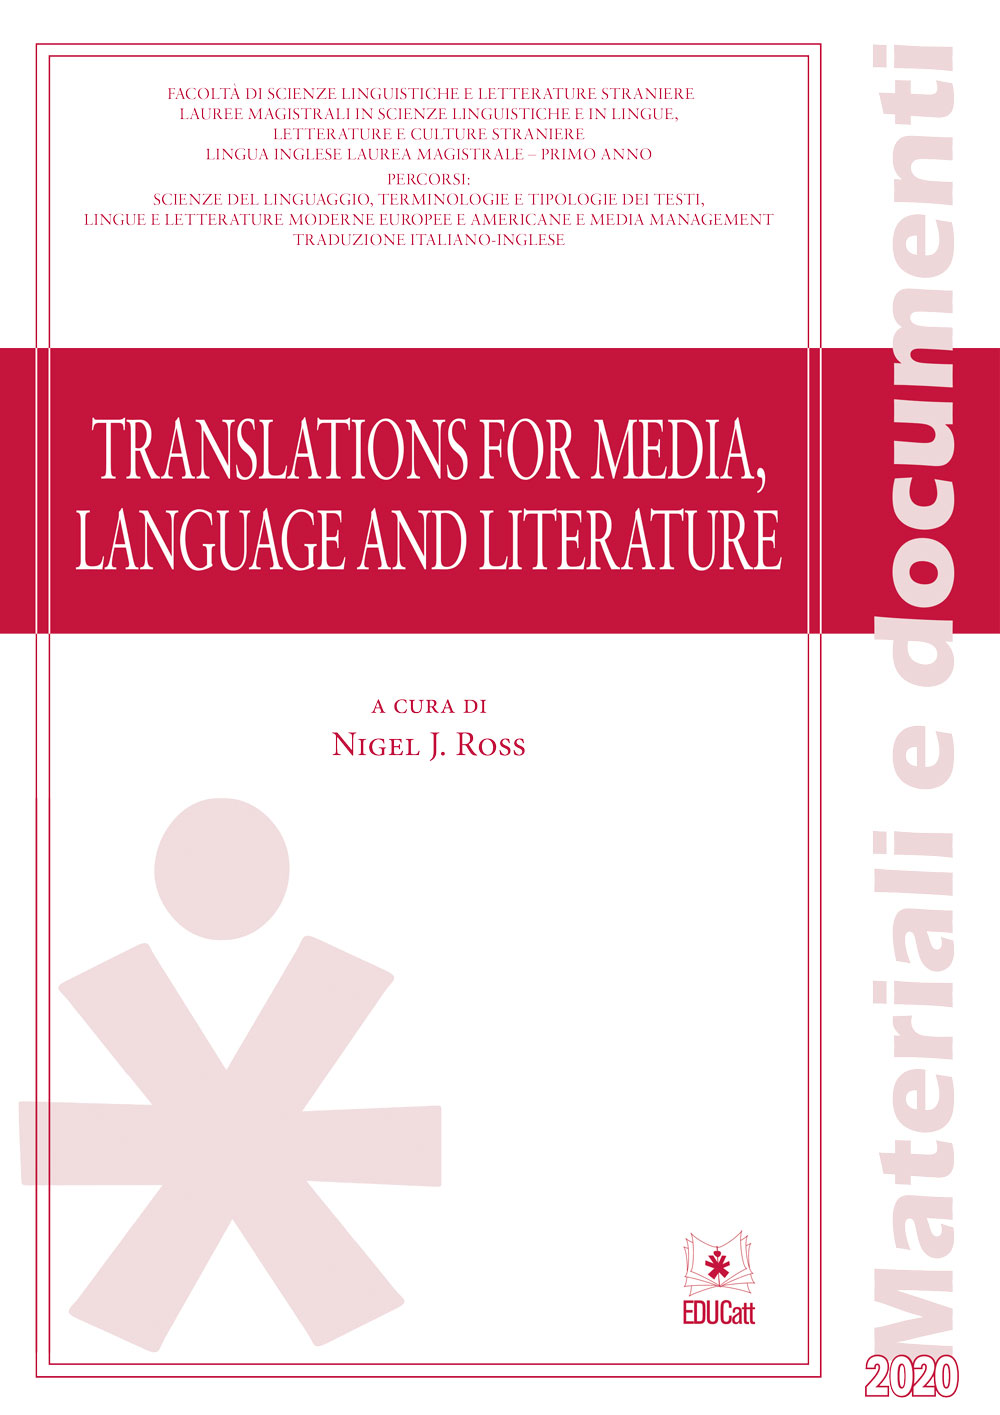 TRANSLATION FOR MEDIA, LANGUAGE AND LITERATURE 2020